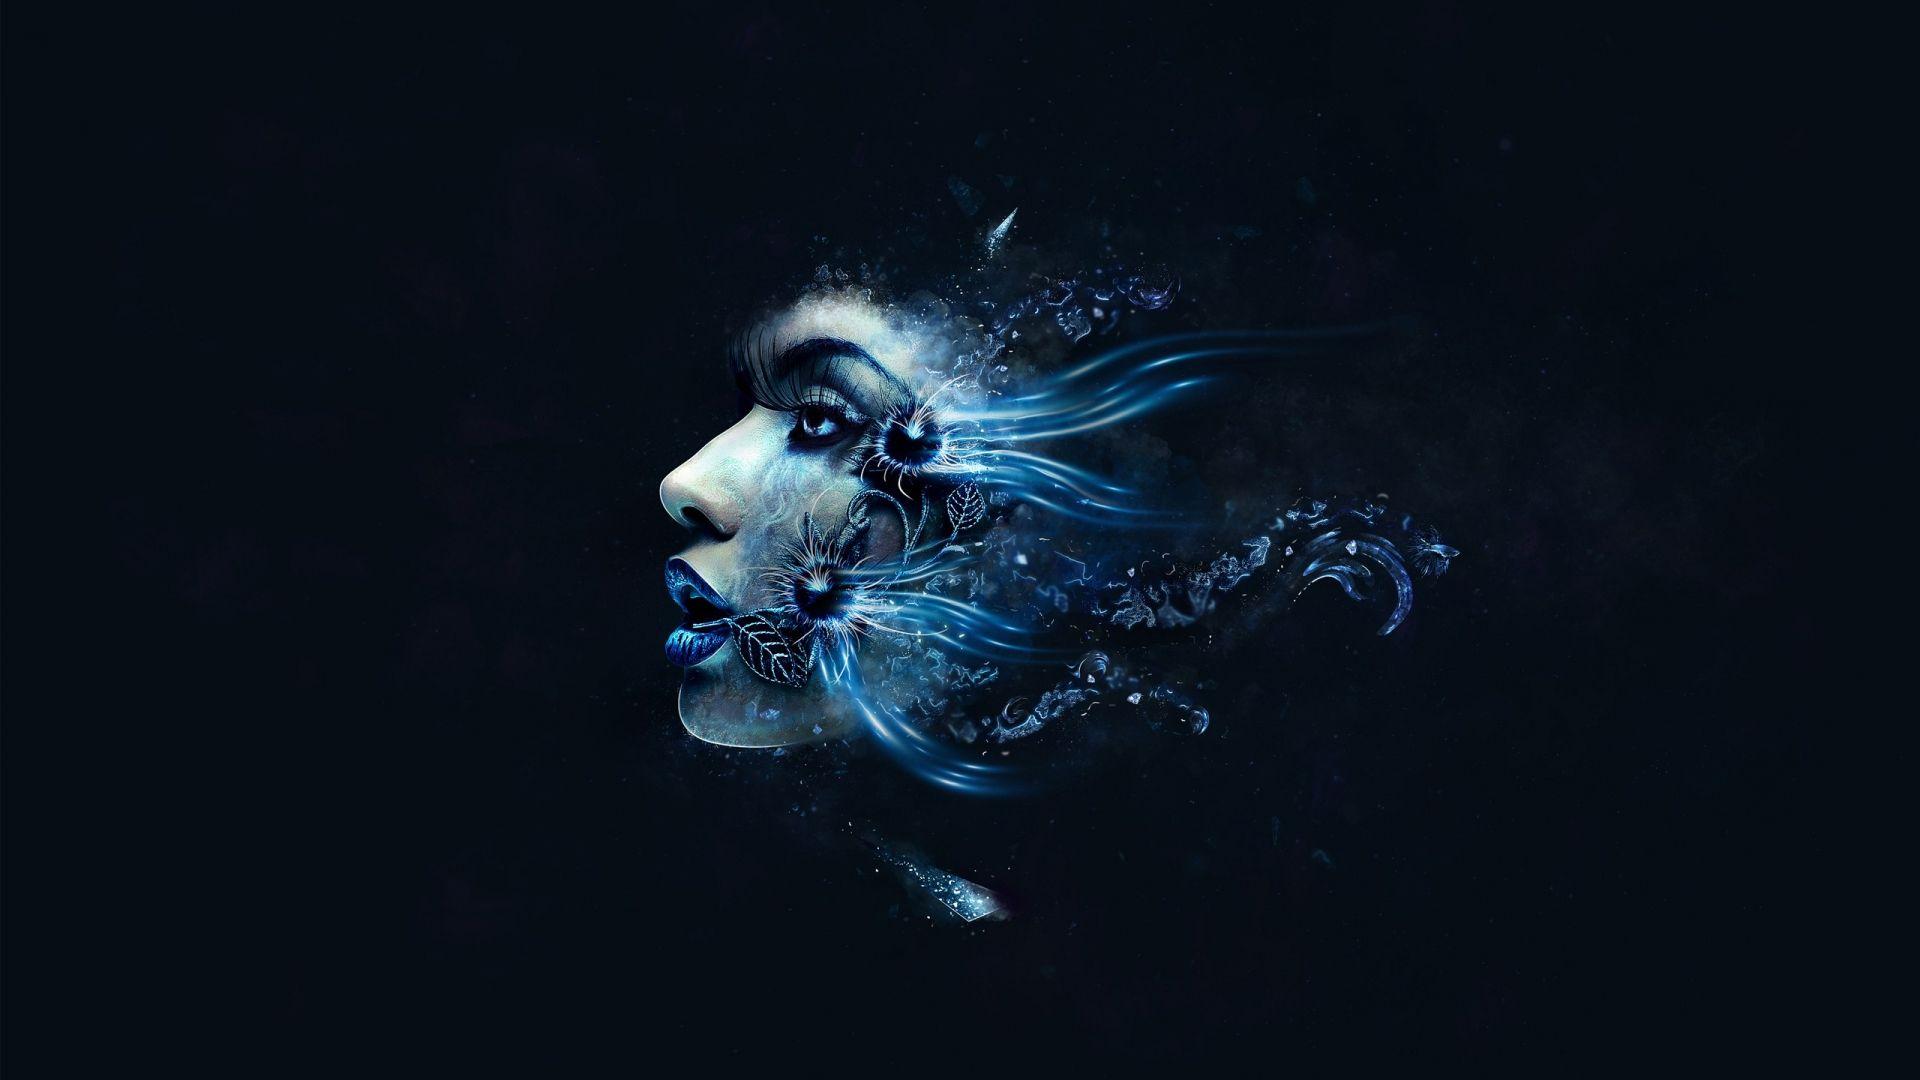 Digital Headphone Wallpaper Girl Black Amp Blue Face 17 Background Hdblackwallpaper Com